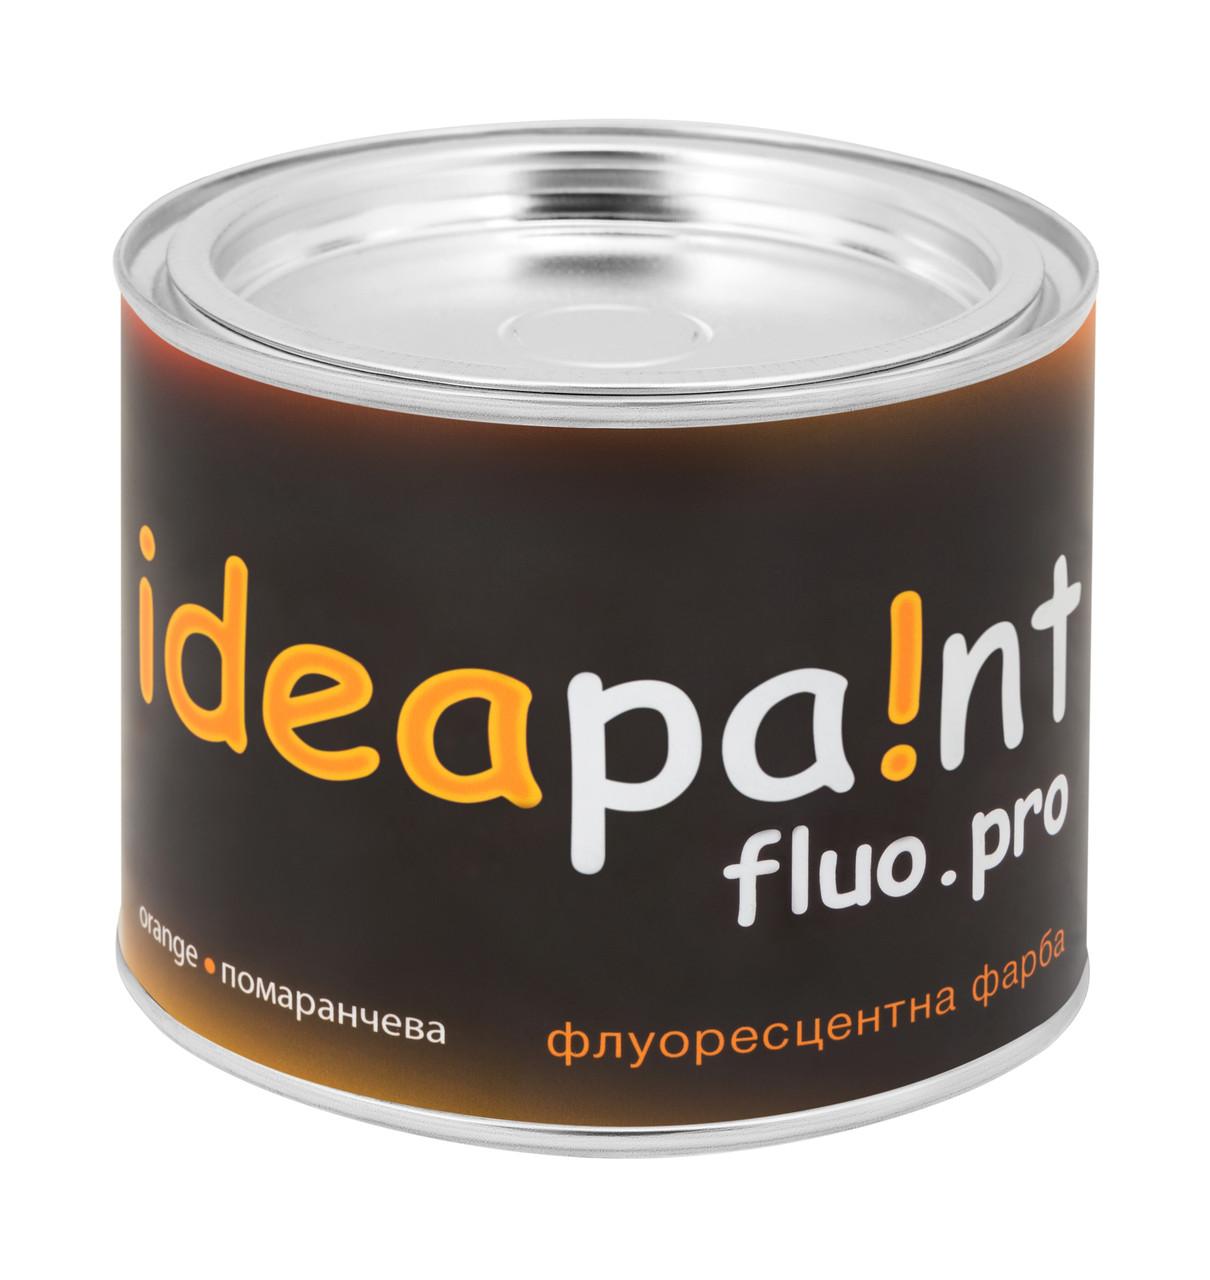 Флуоресцентная краска оранжевая ideapaint  0,5 л.